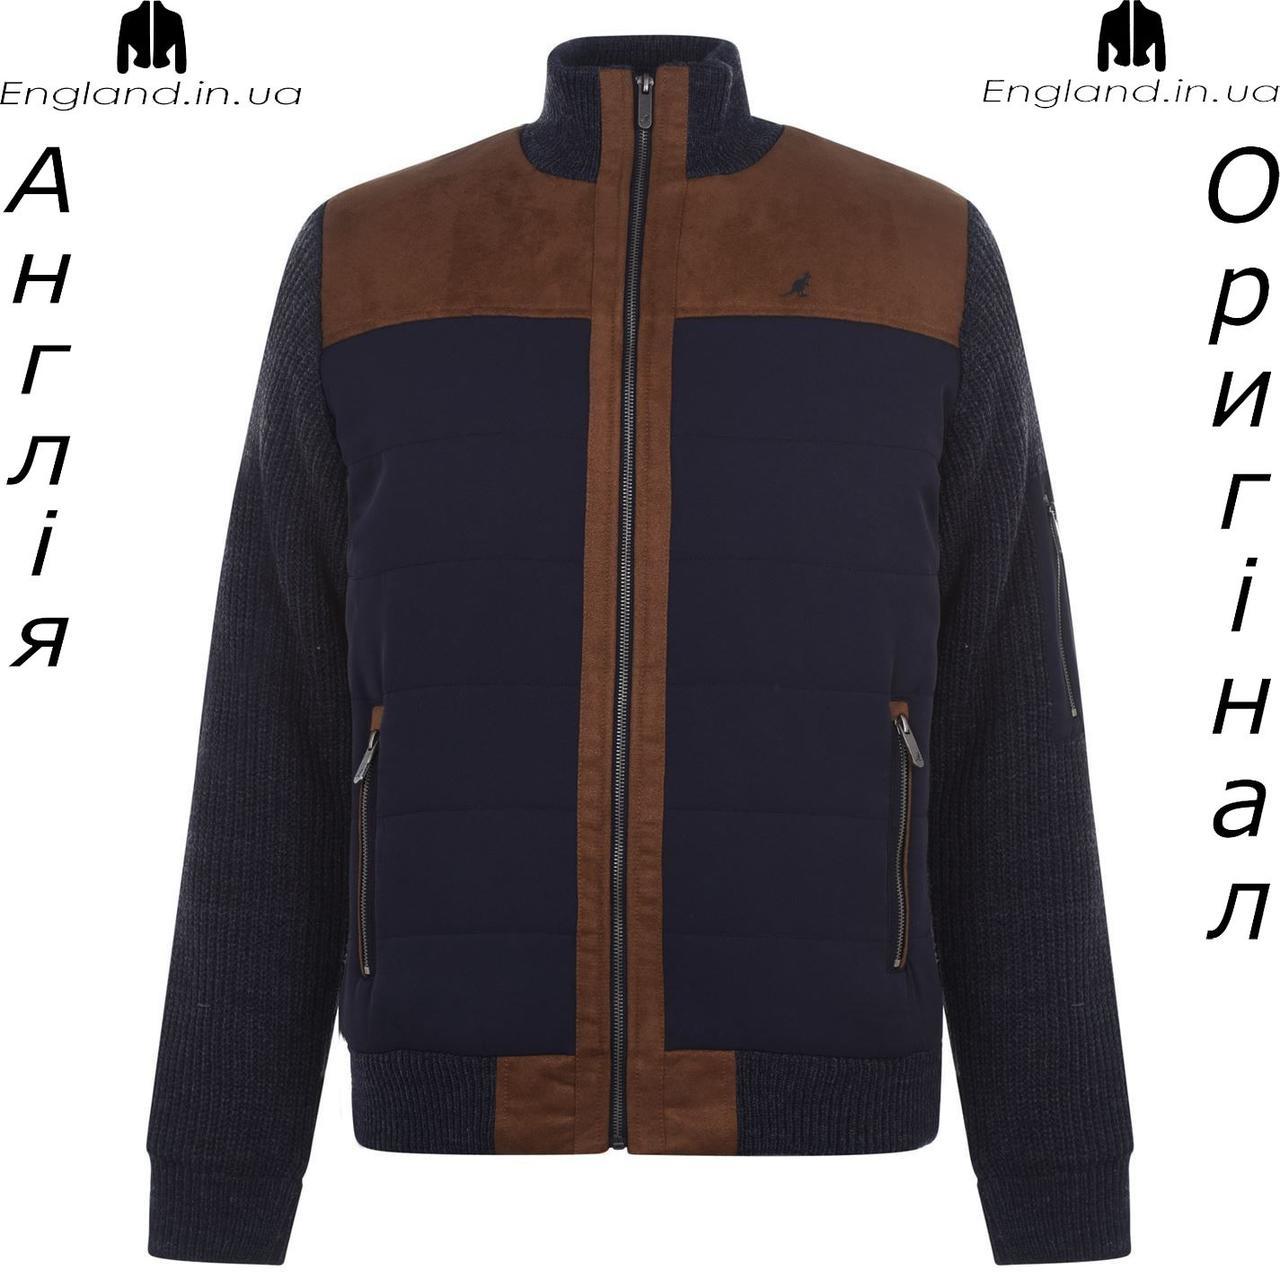 Куртка - свитер мужская Kangol из Англии - зимняя